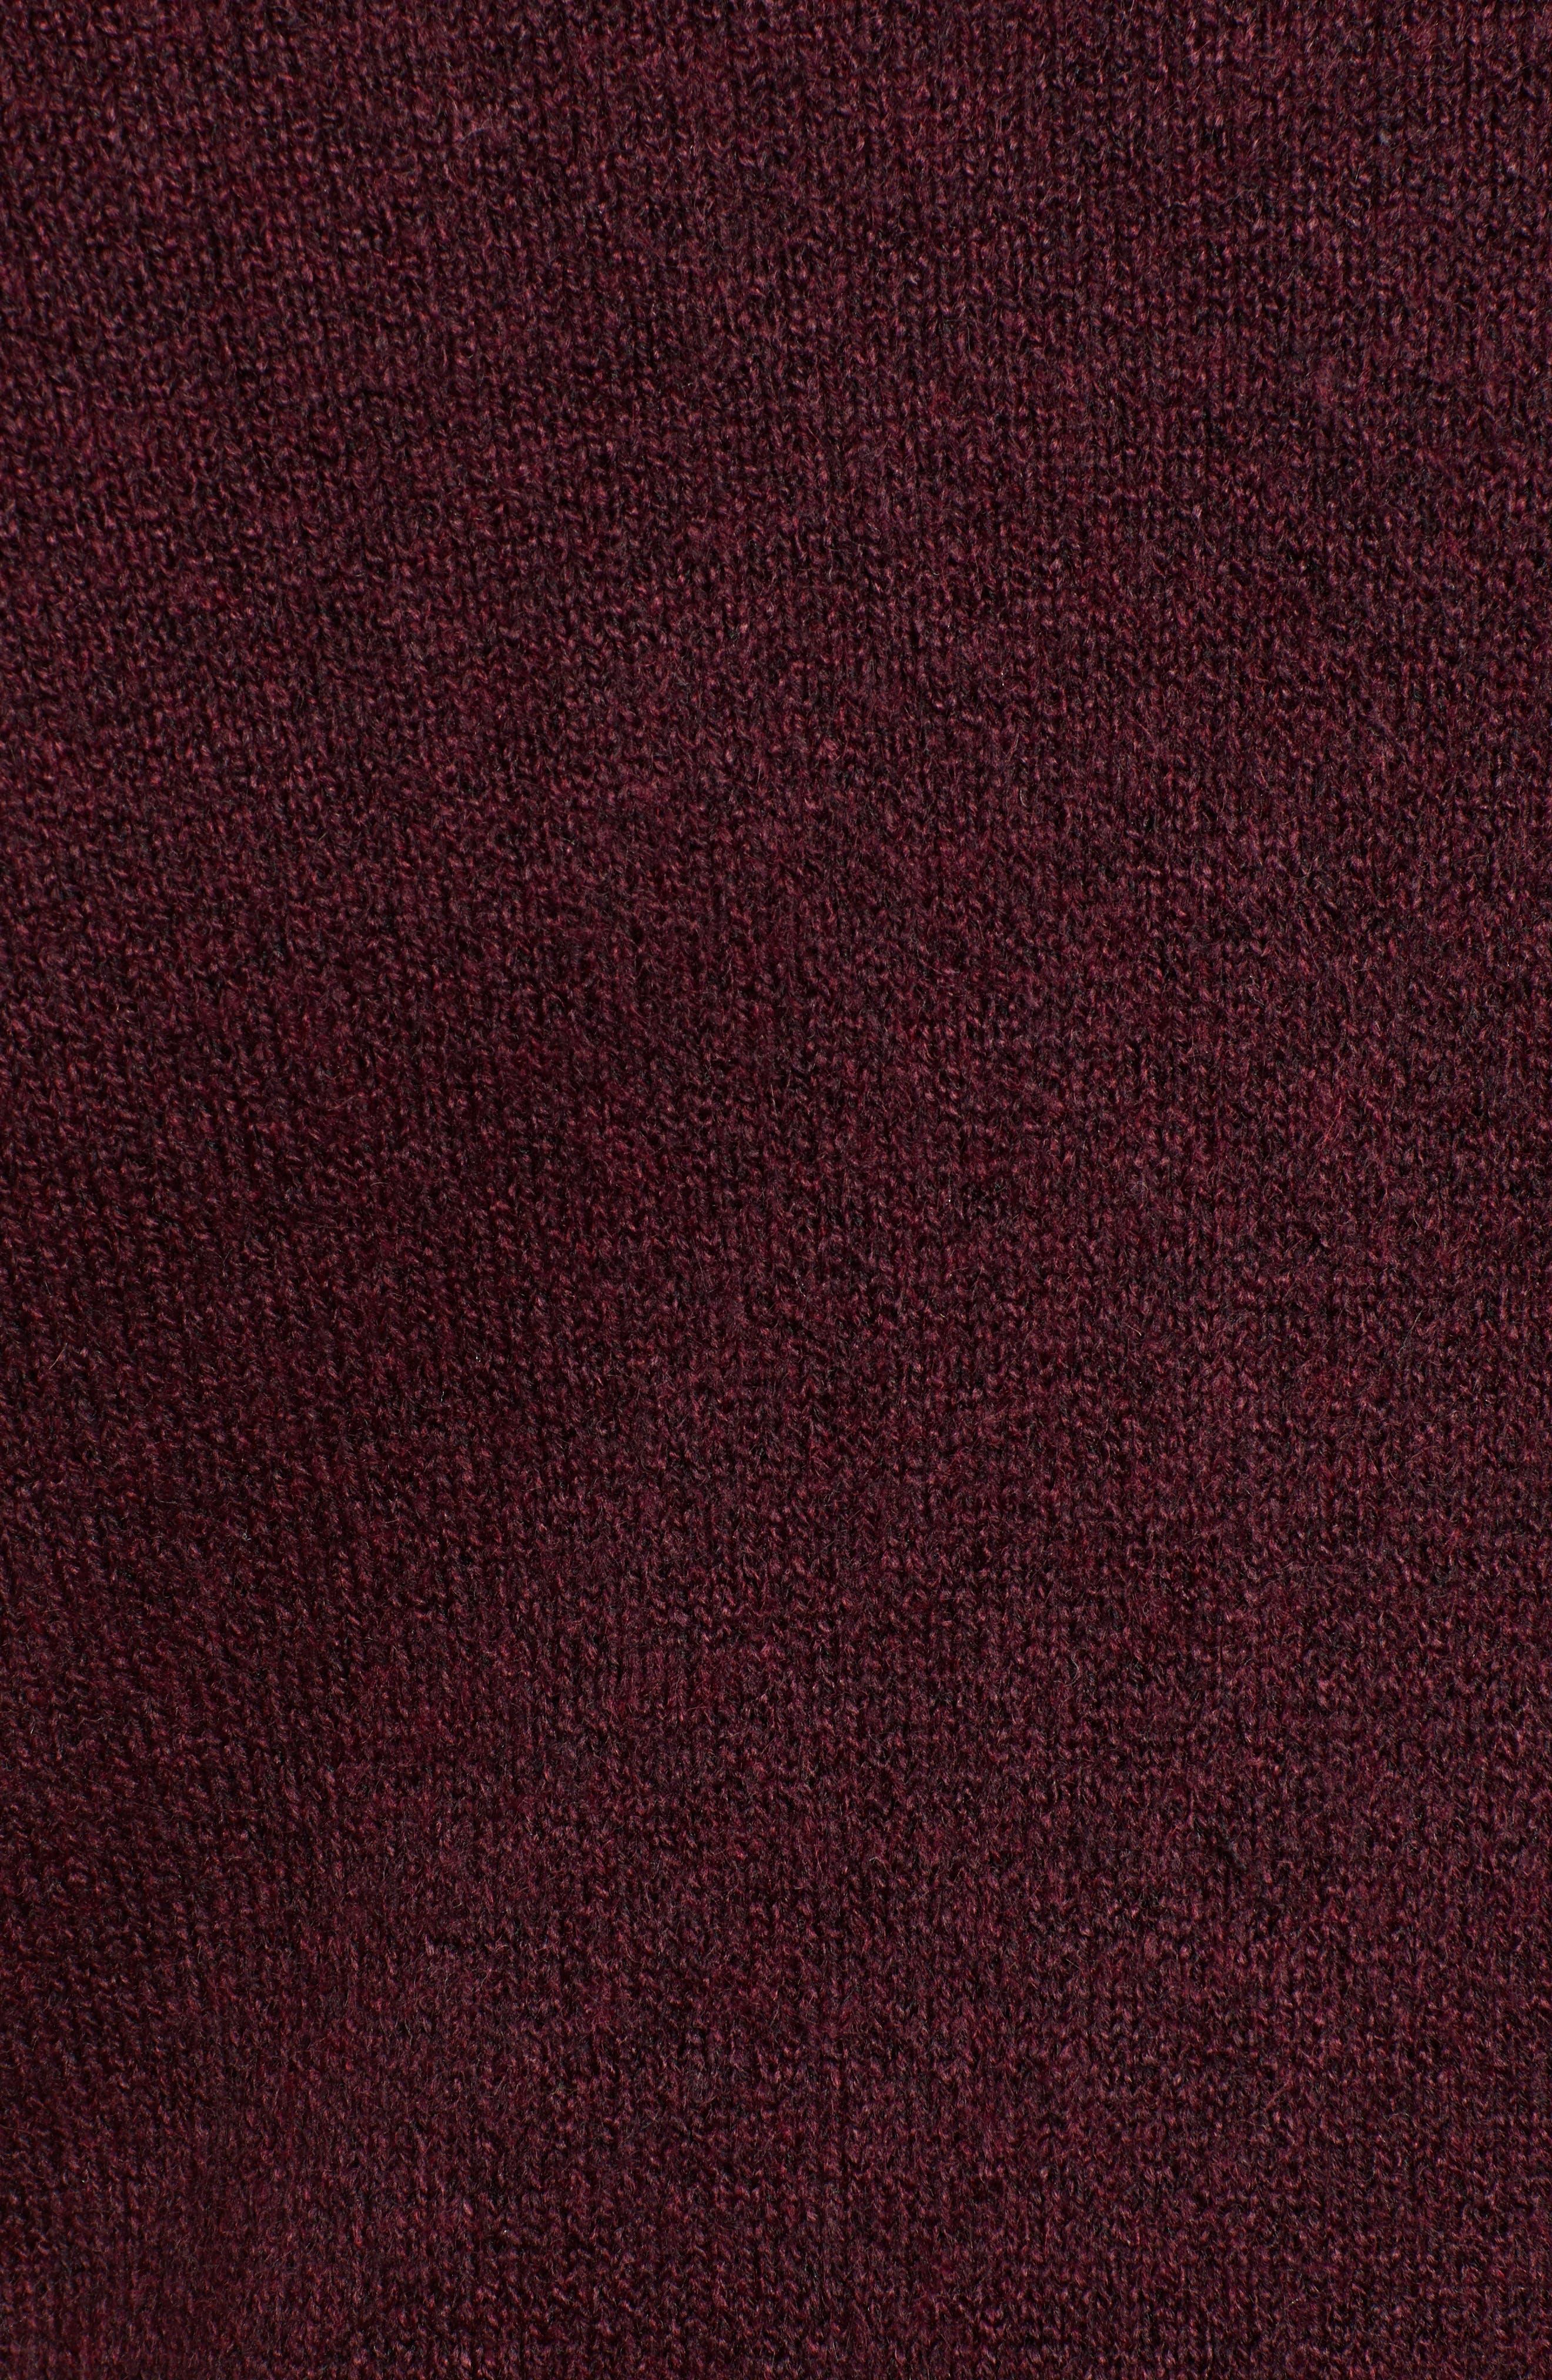 Pocket Sweater Coat,                             Alternate thumbnail 5, color,                             BURGUNDY TO MATCH DRESS